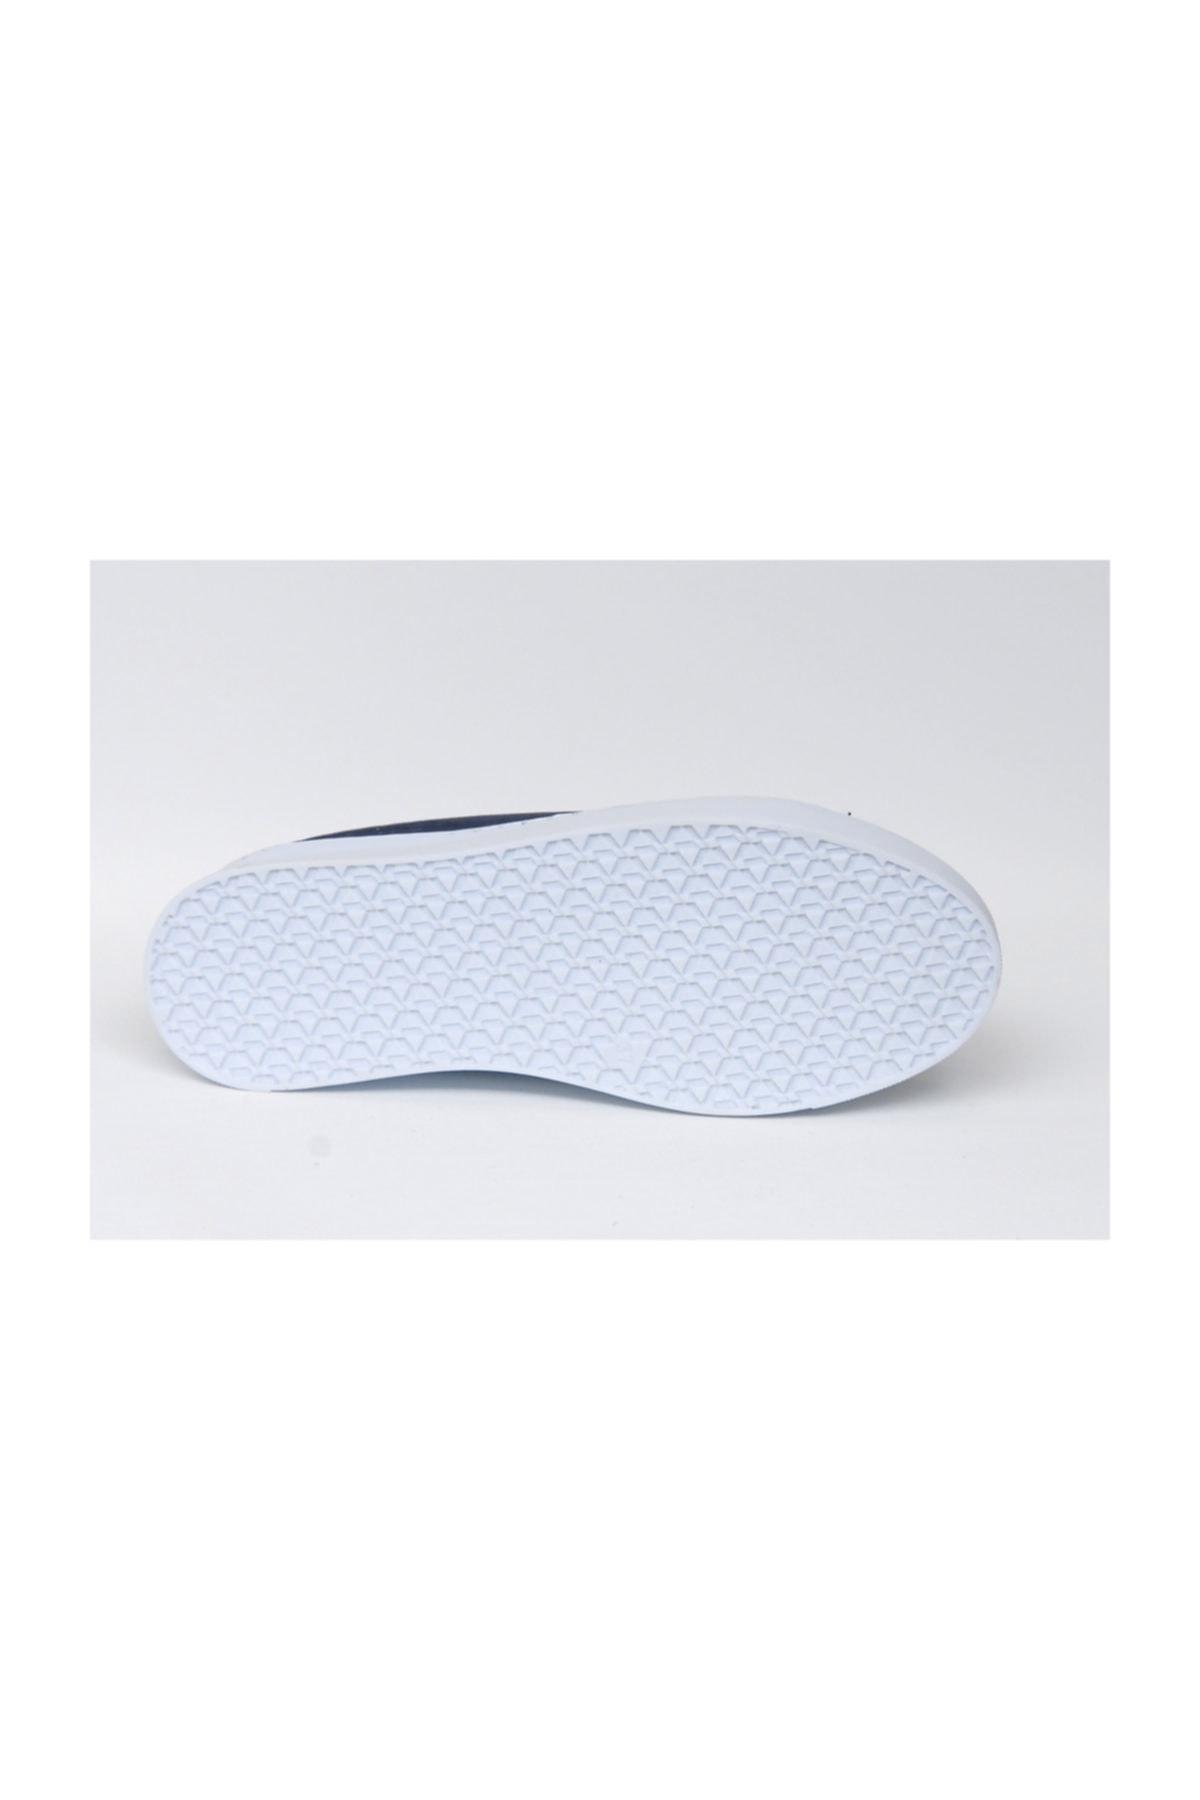 MİADORA Kadın Spor Ayakkabı 2